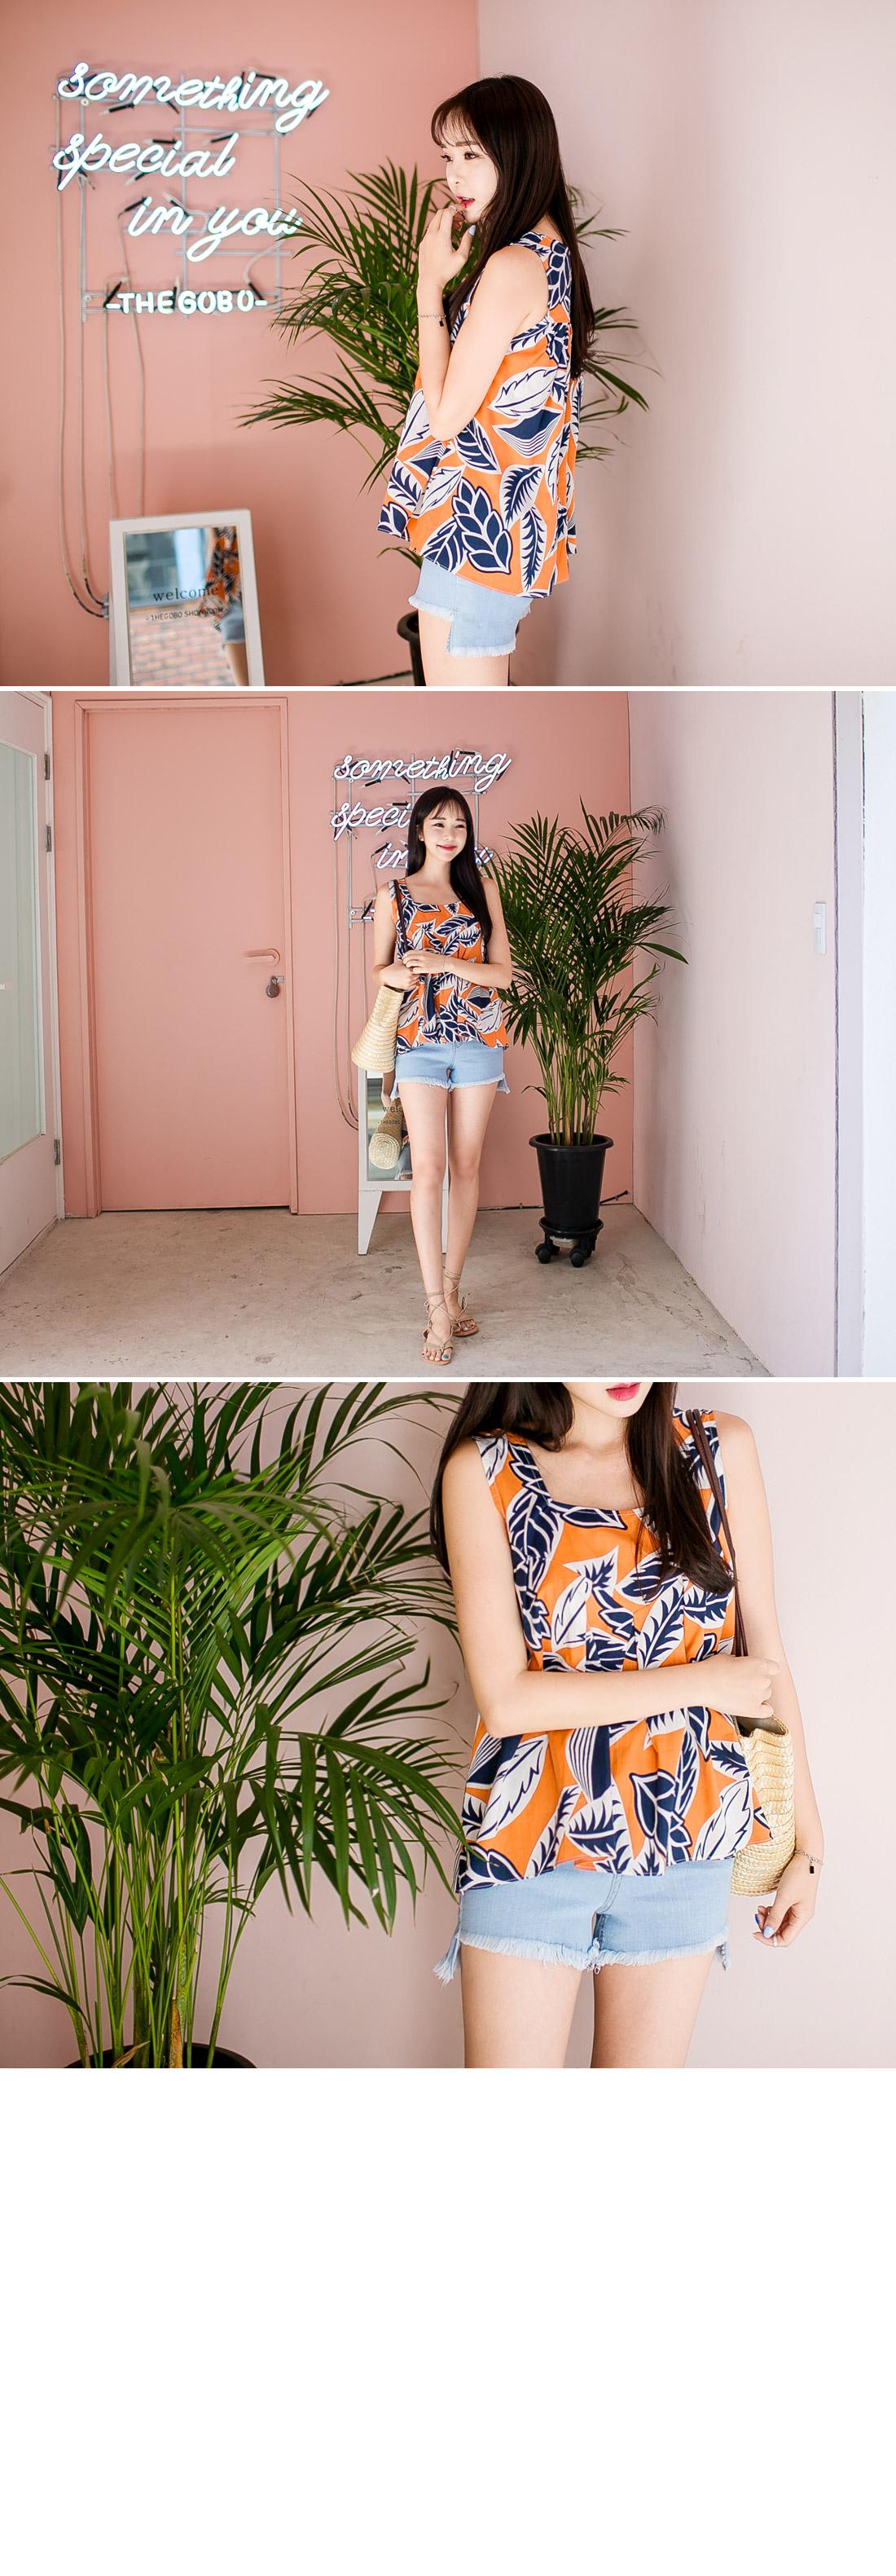 Square flower blouse